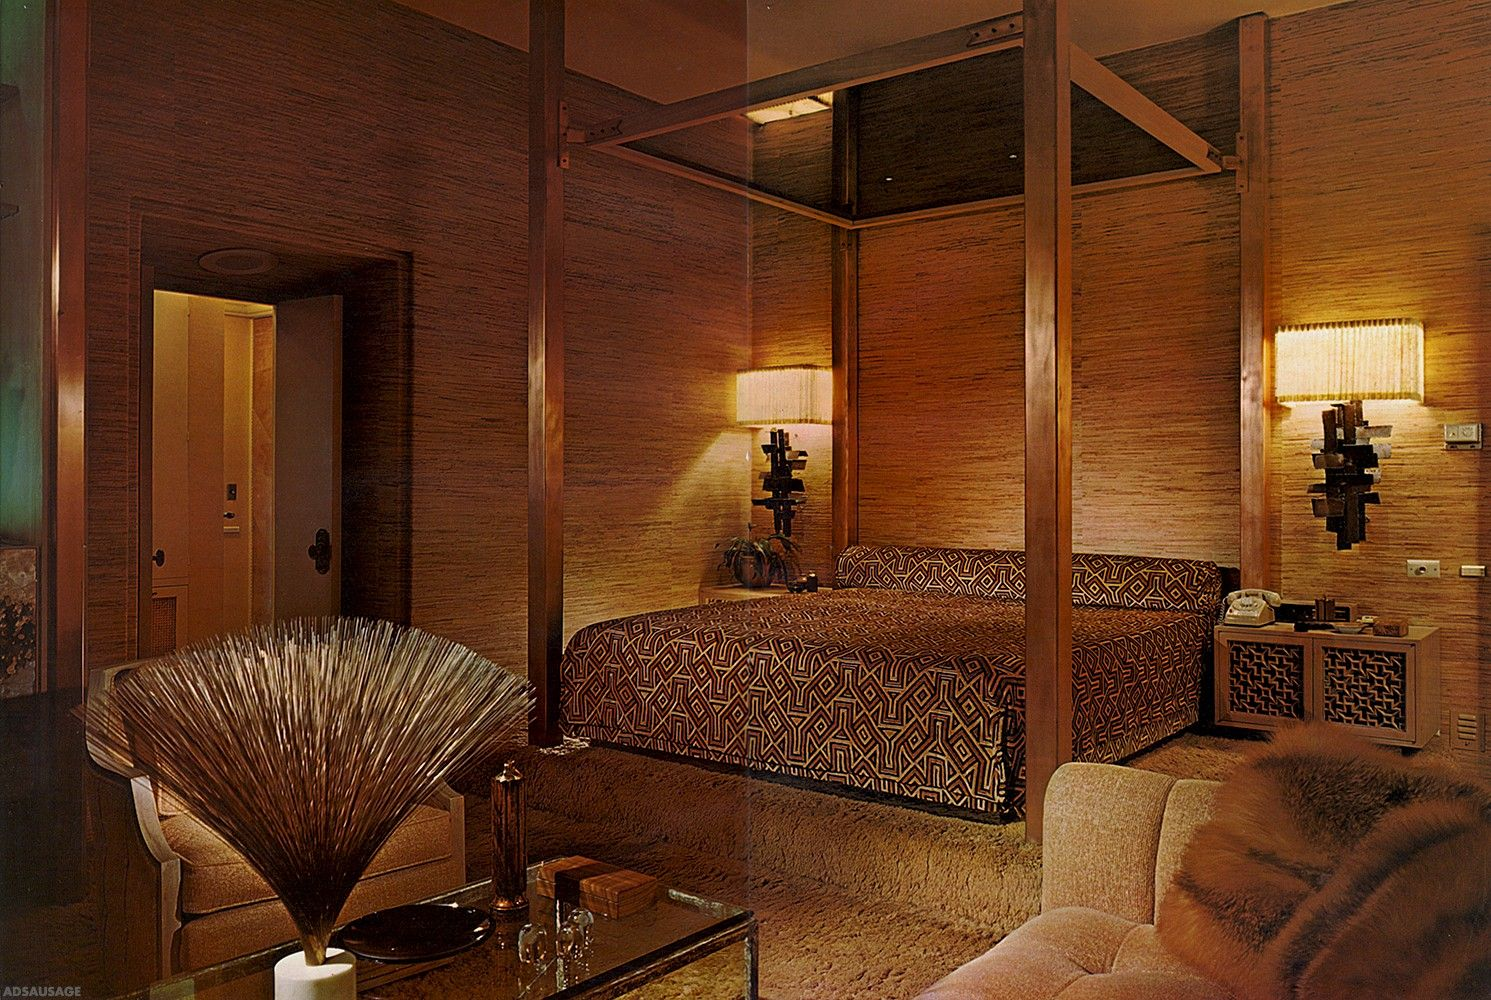 Design 19601970 Retro bedrooms, Mid century decor